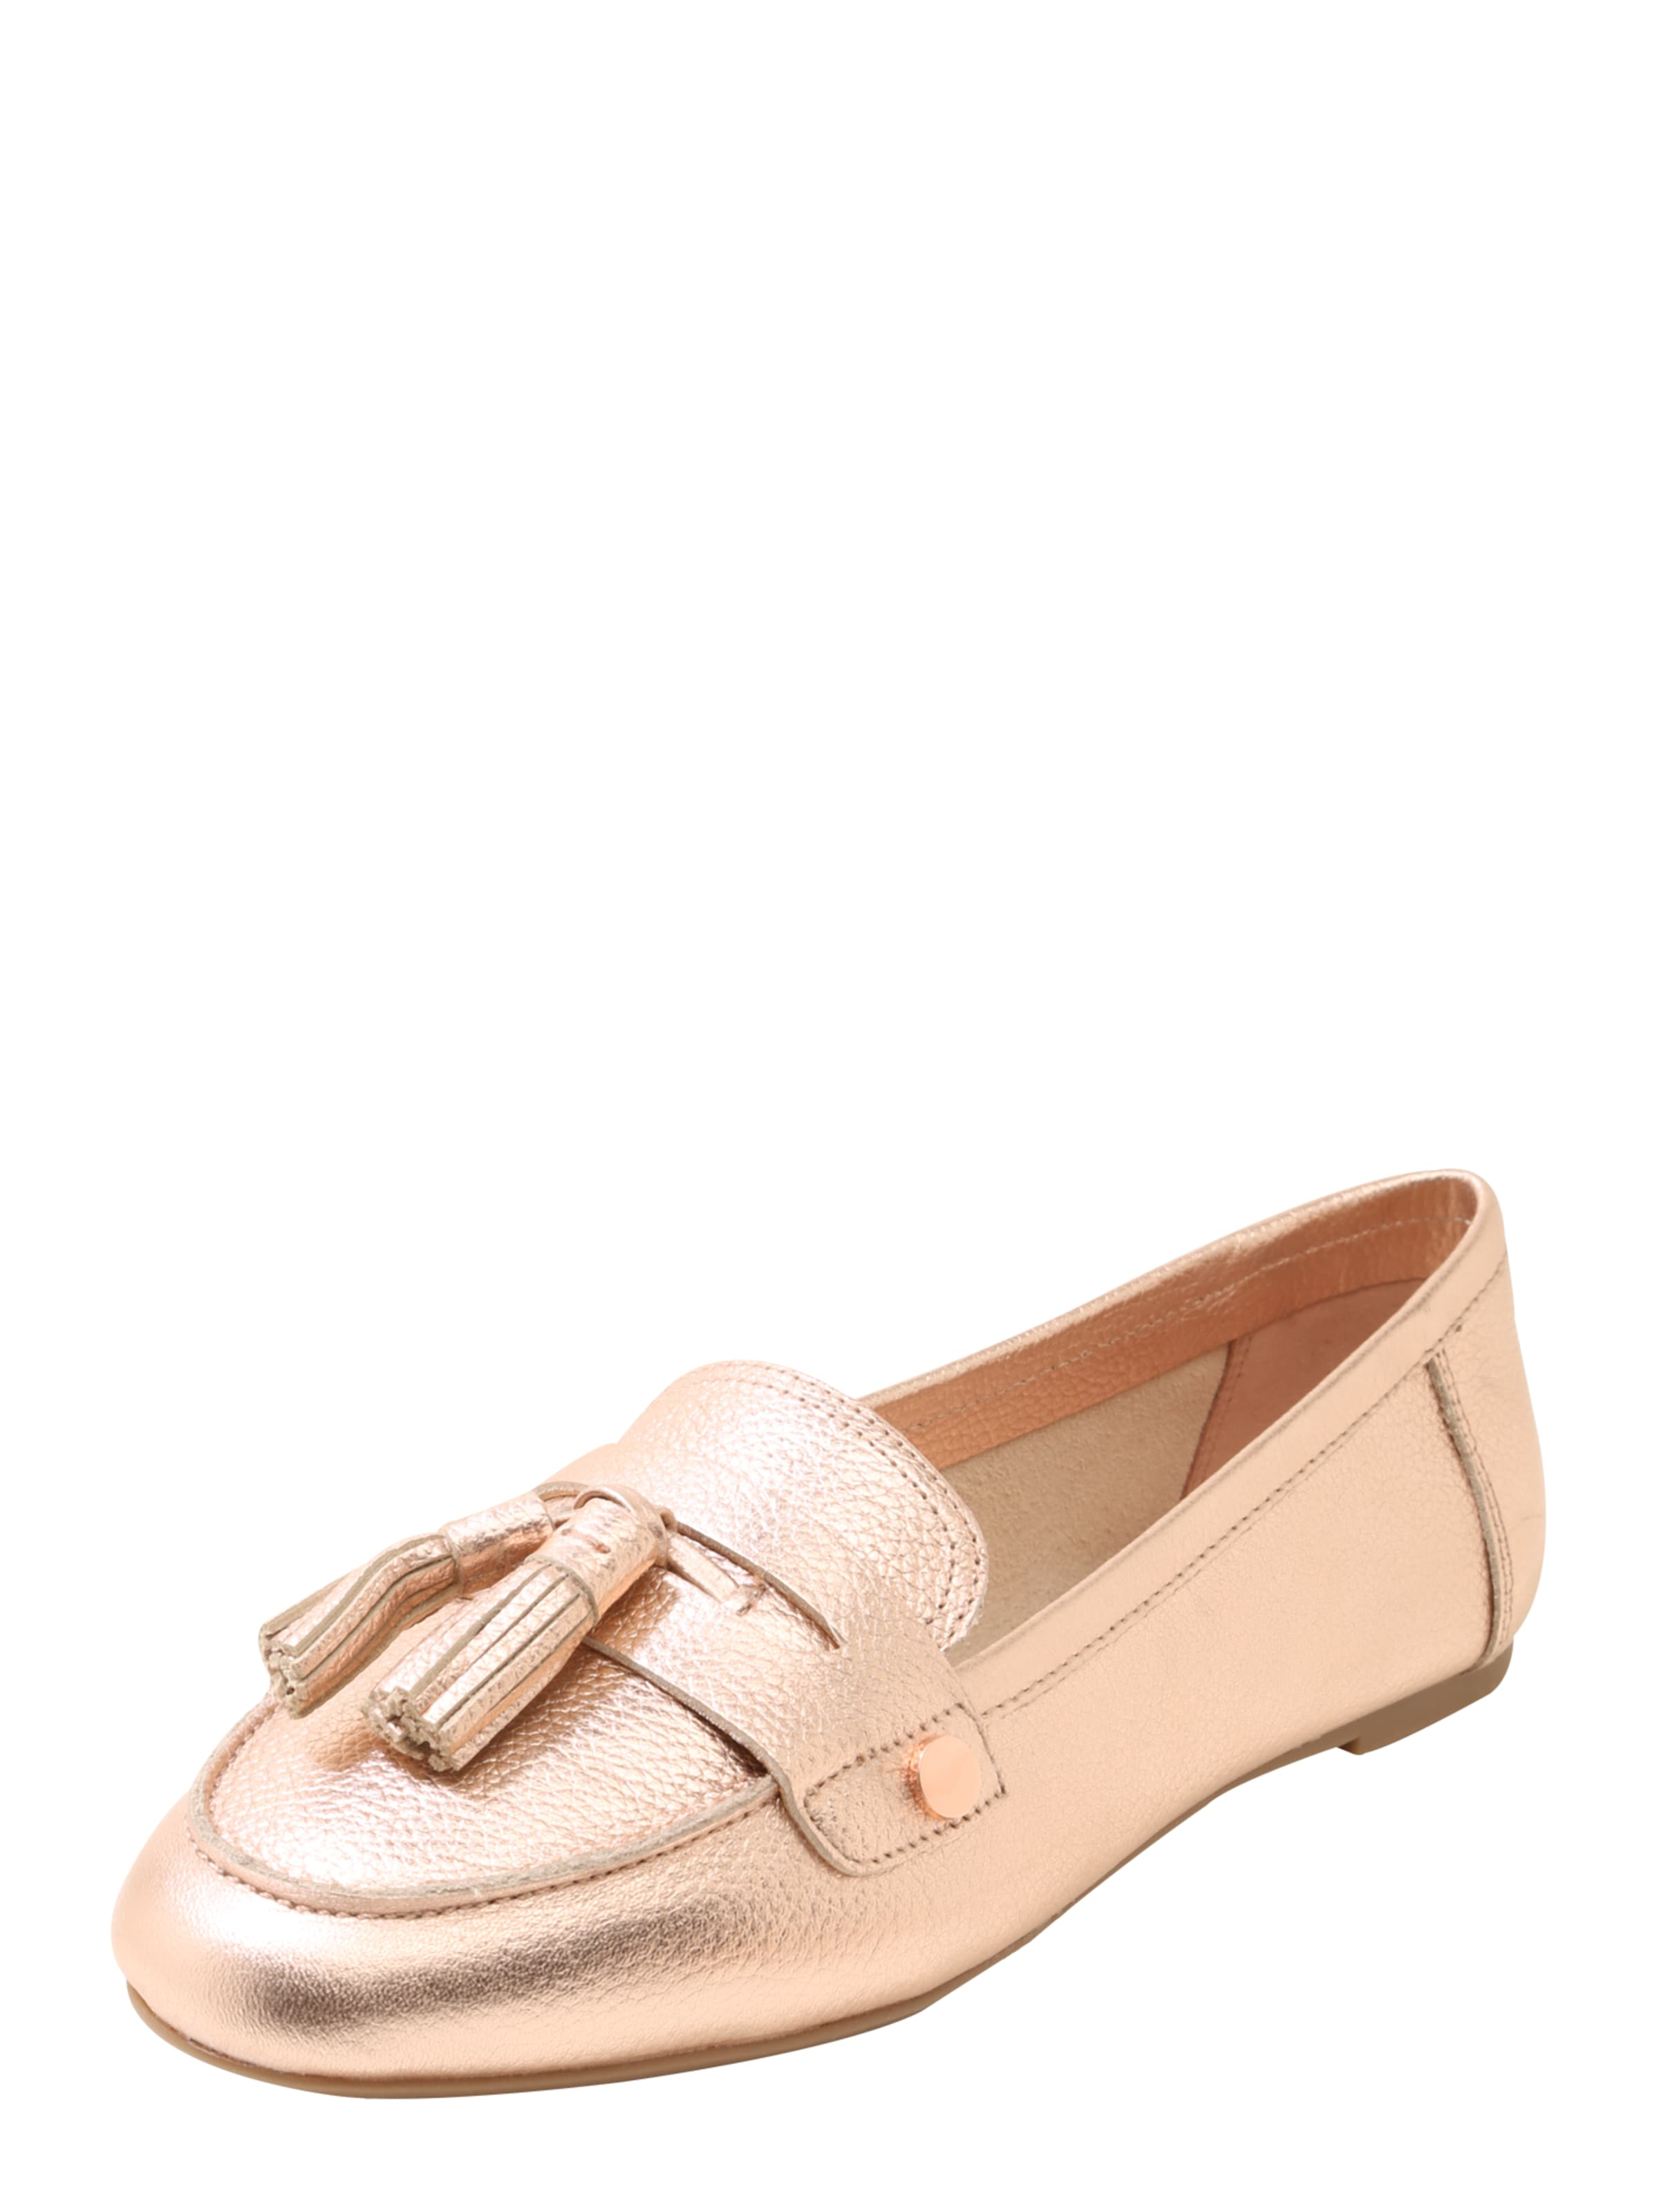 Haltbare Mode billige Schuhe ALDO | Slipper 'YELIVIEL' Schuhe Gut getragene Schuhe